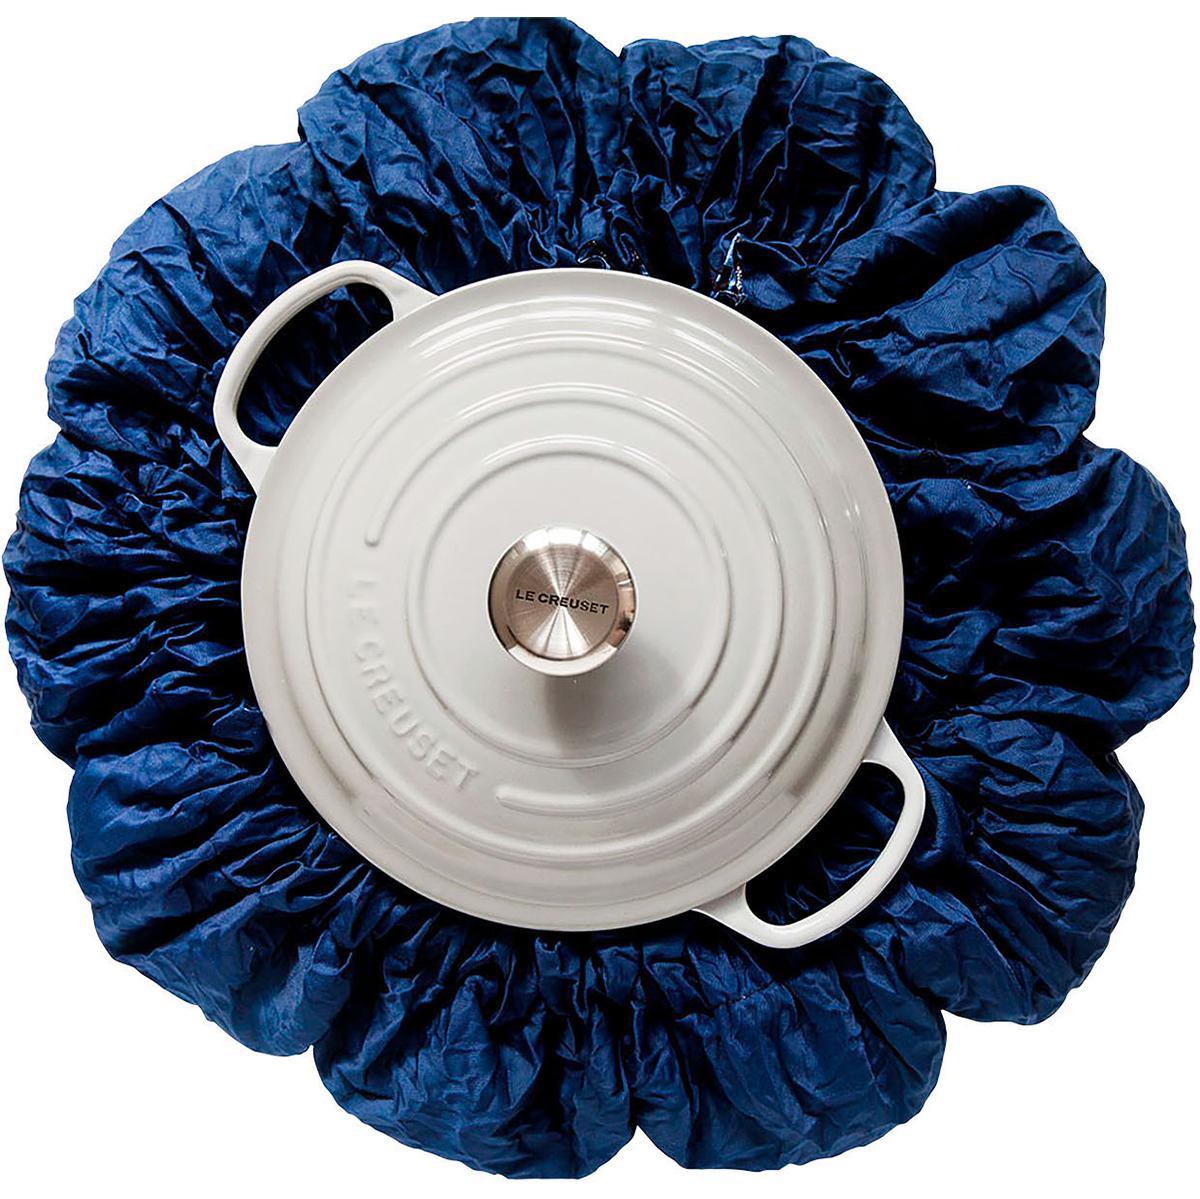 bluebag around cooking pot